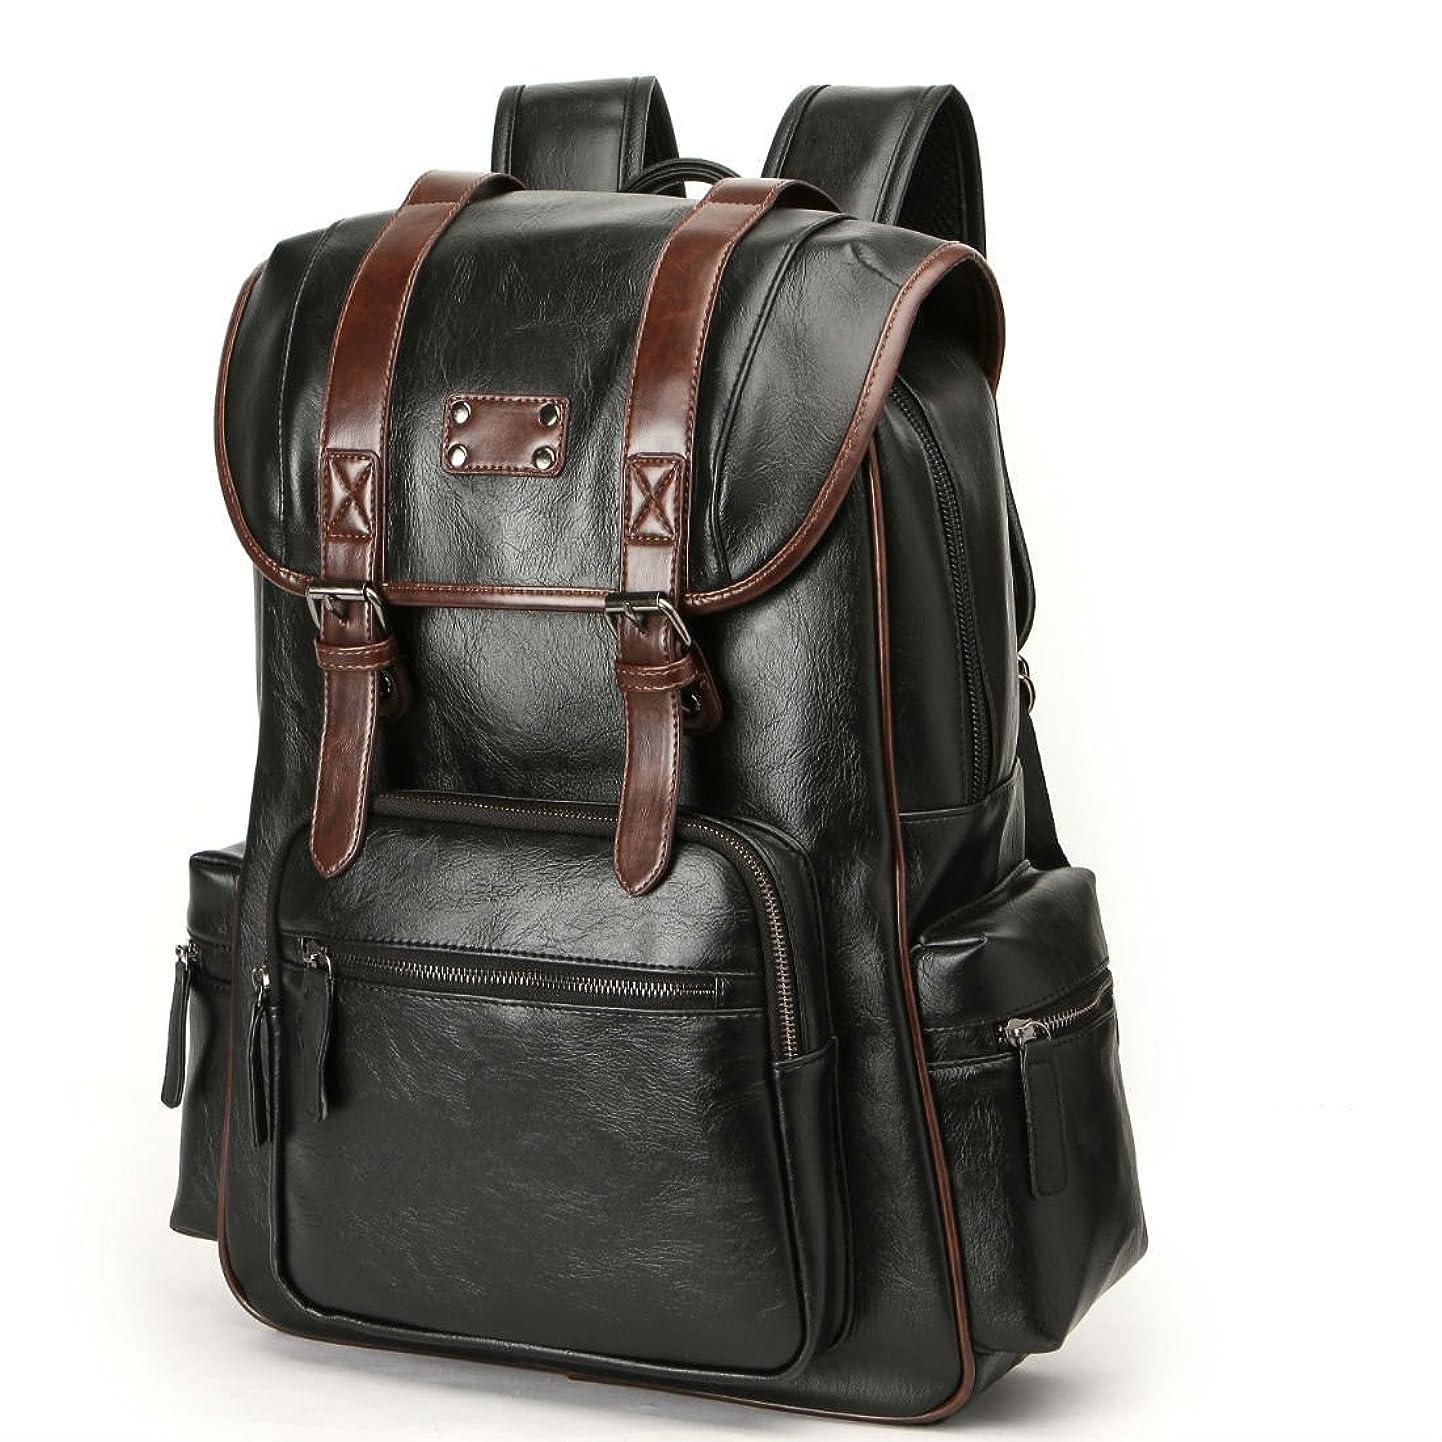 Bag,handbags,shoulder bags Laptop backpack schoolbags travel bags knapsack bookbags Luggage packsack for men,boys,and large capacity pu leather black (black-3) denofkzytpu8